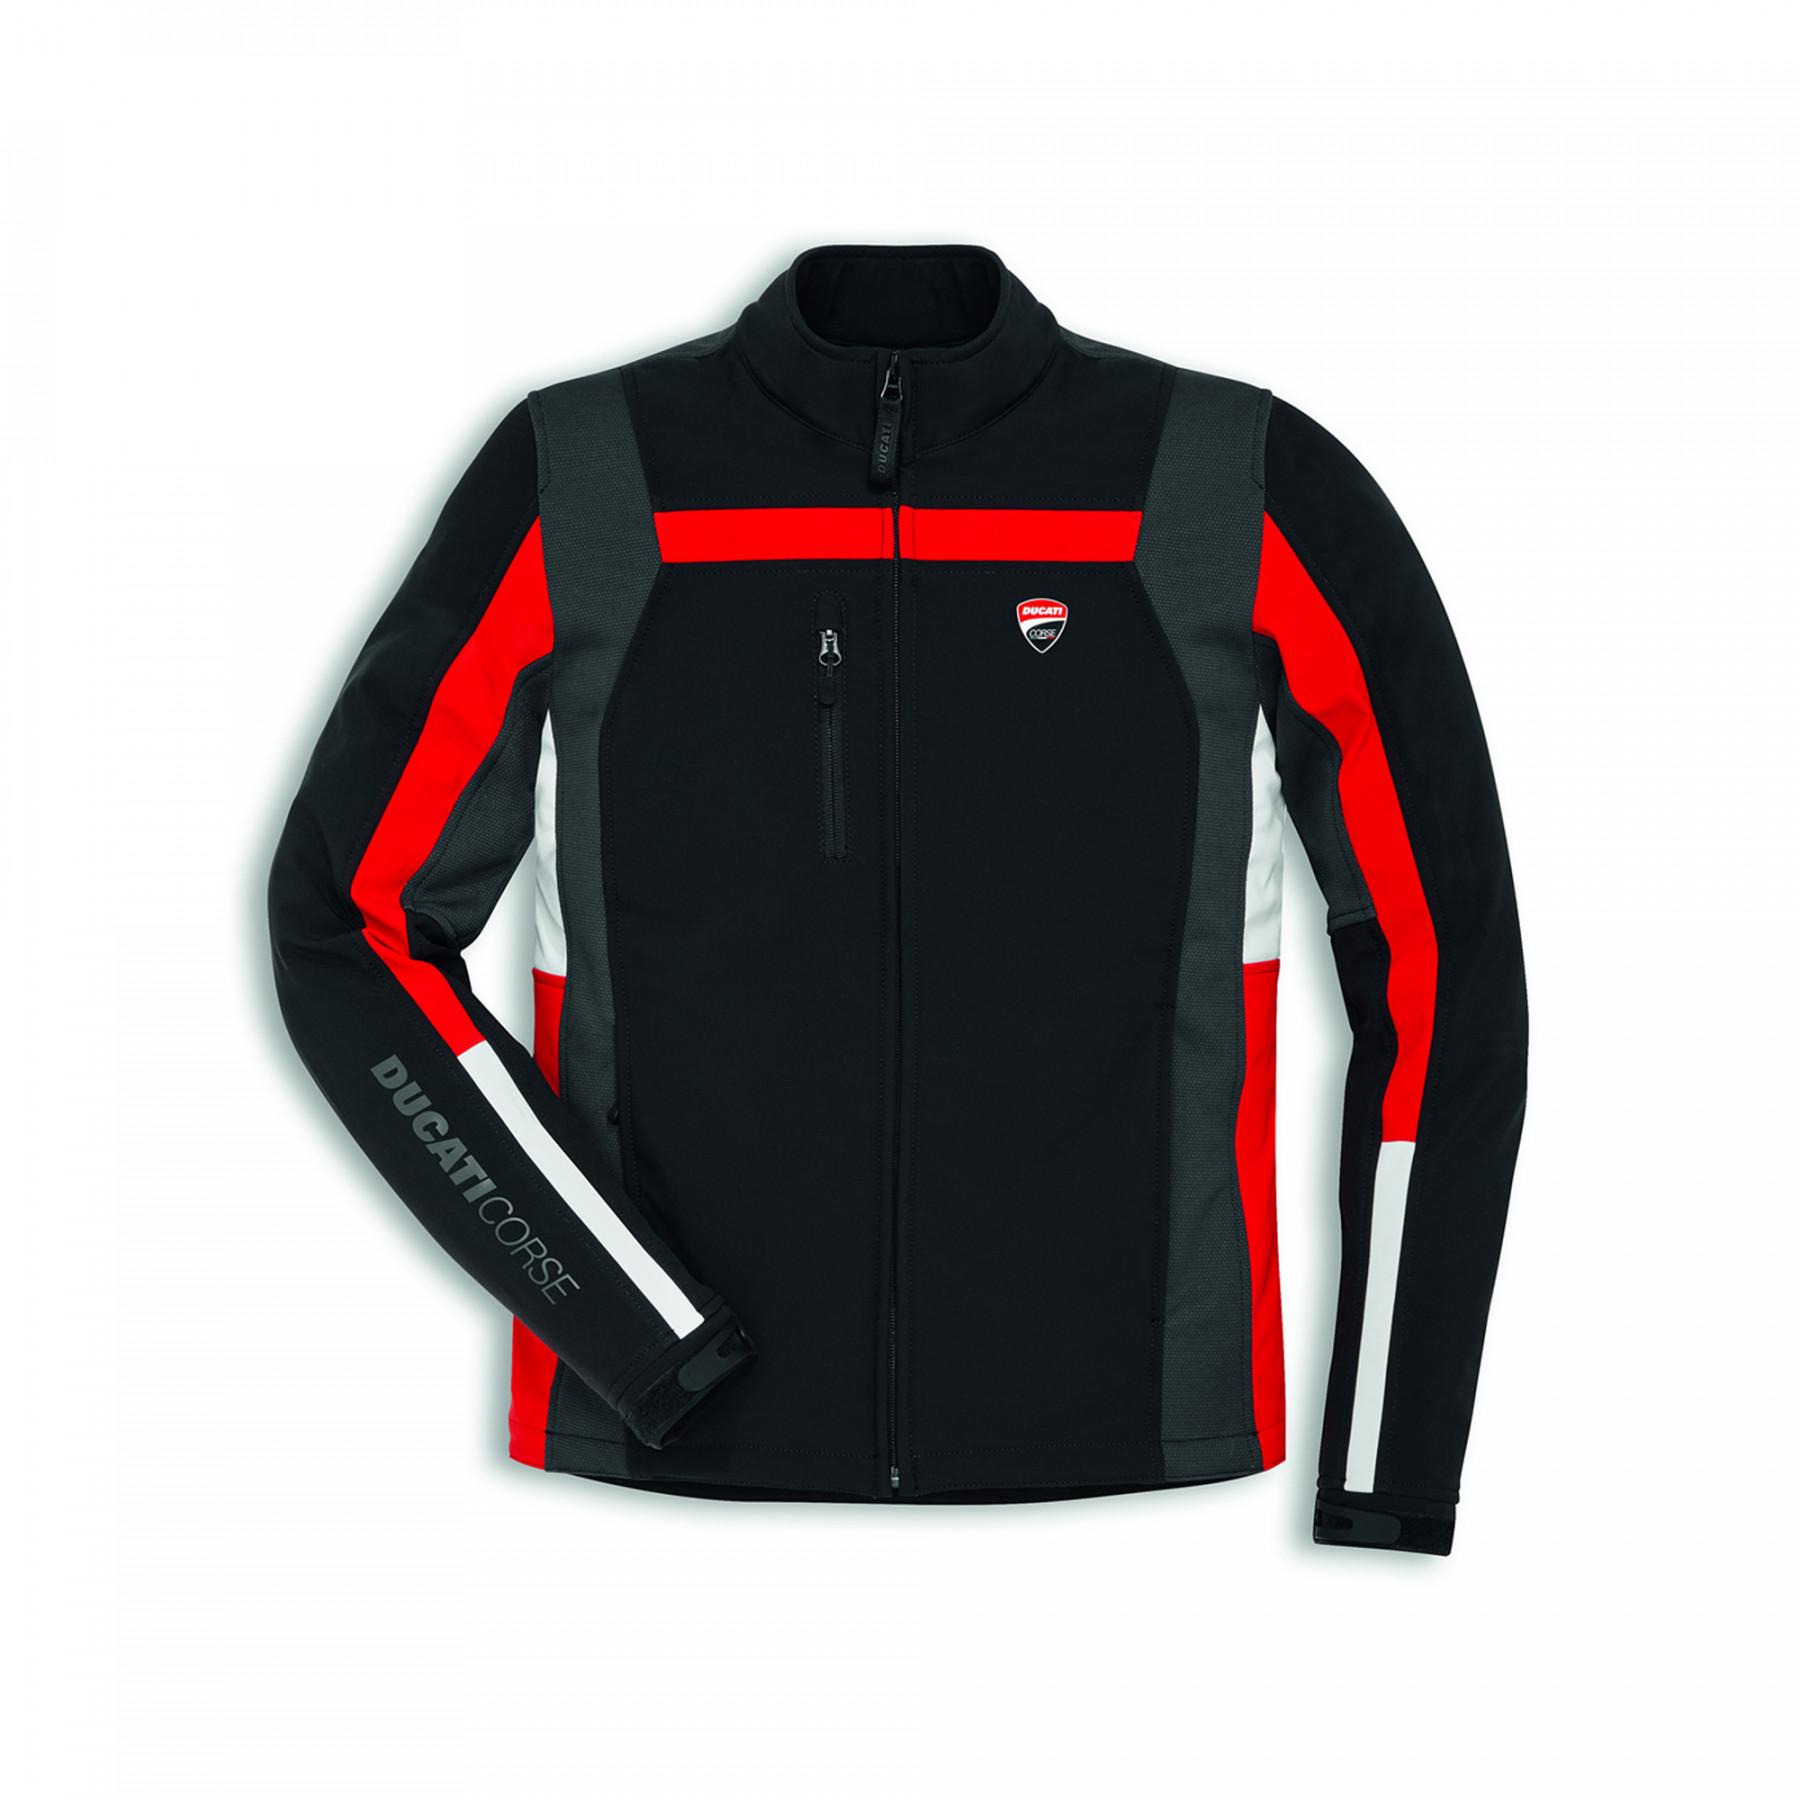 Ducat jas Corse Windproof 3 €158,00